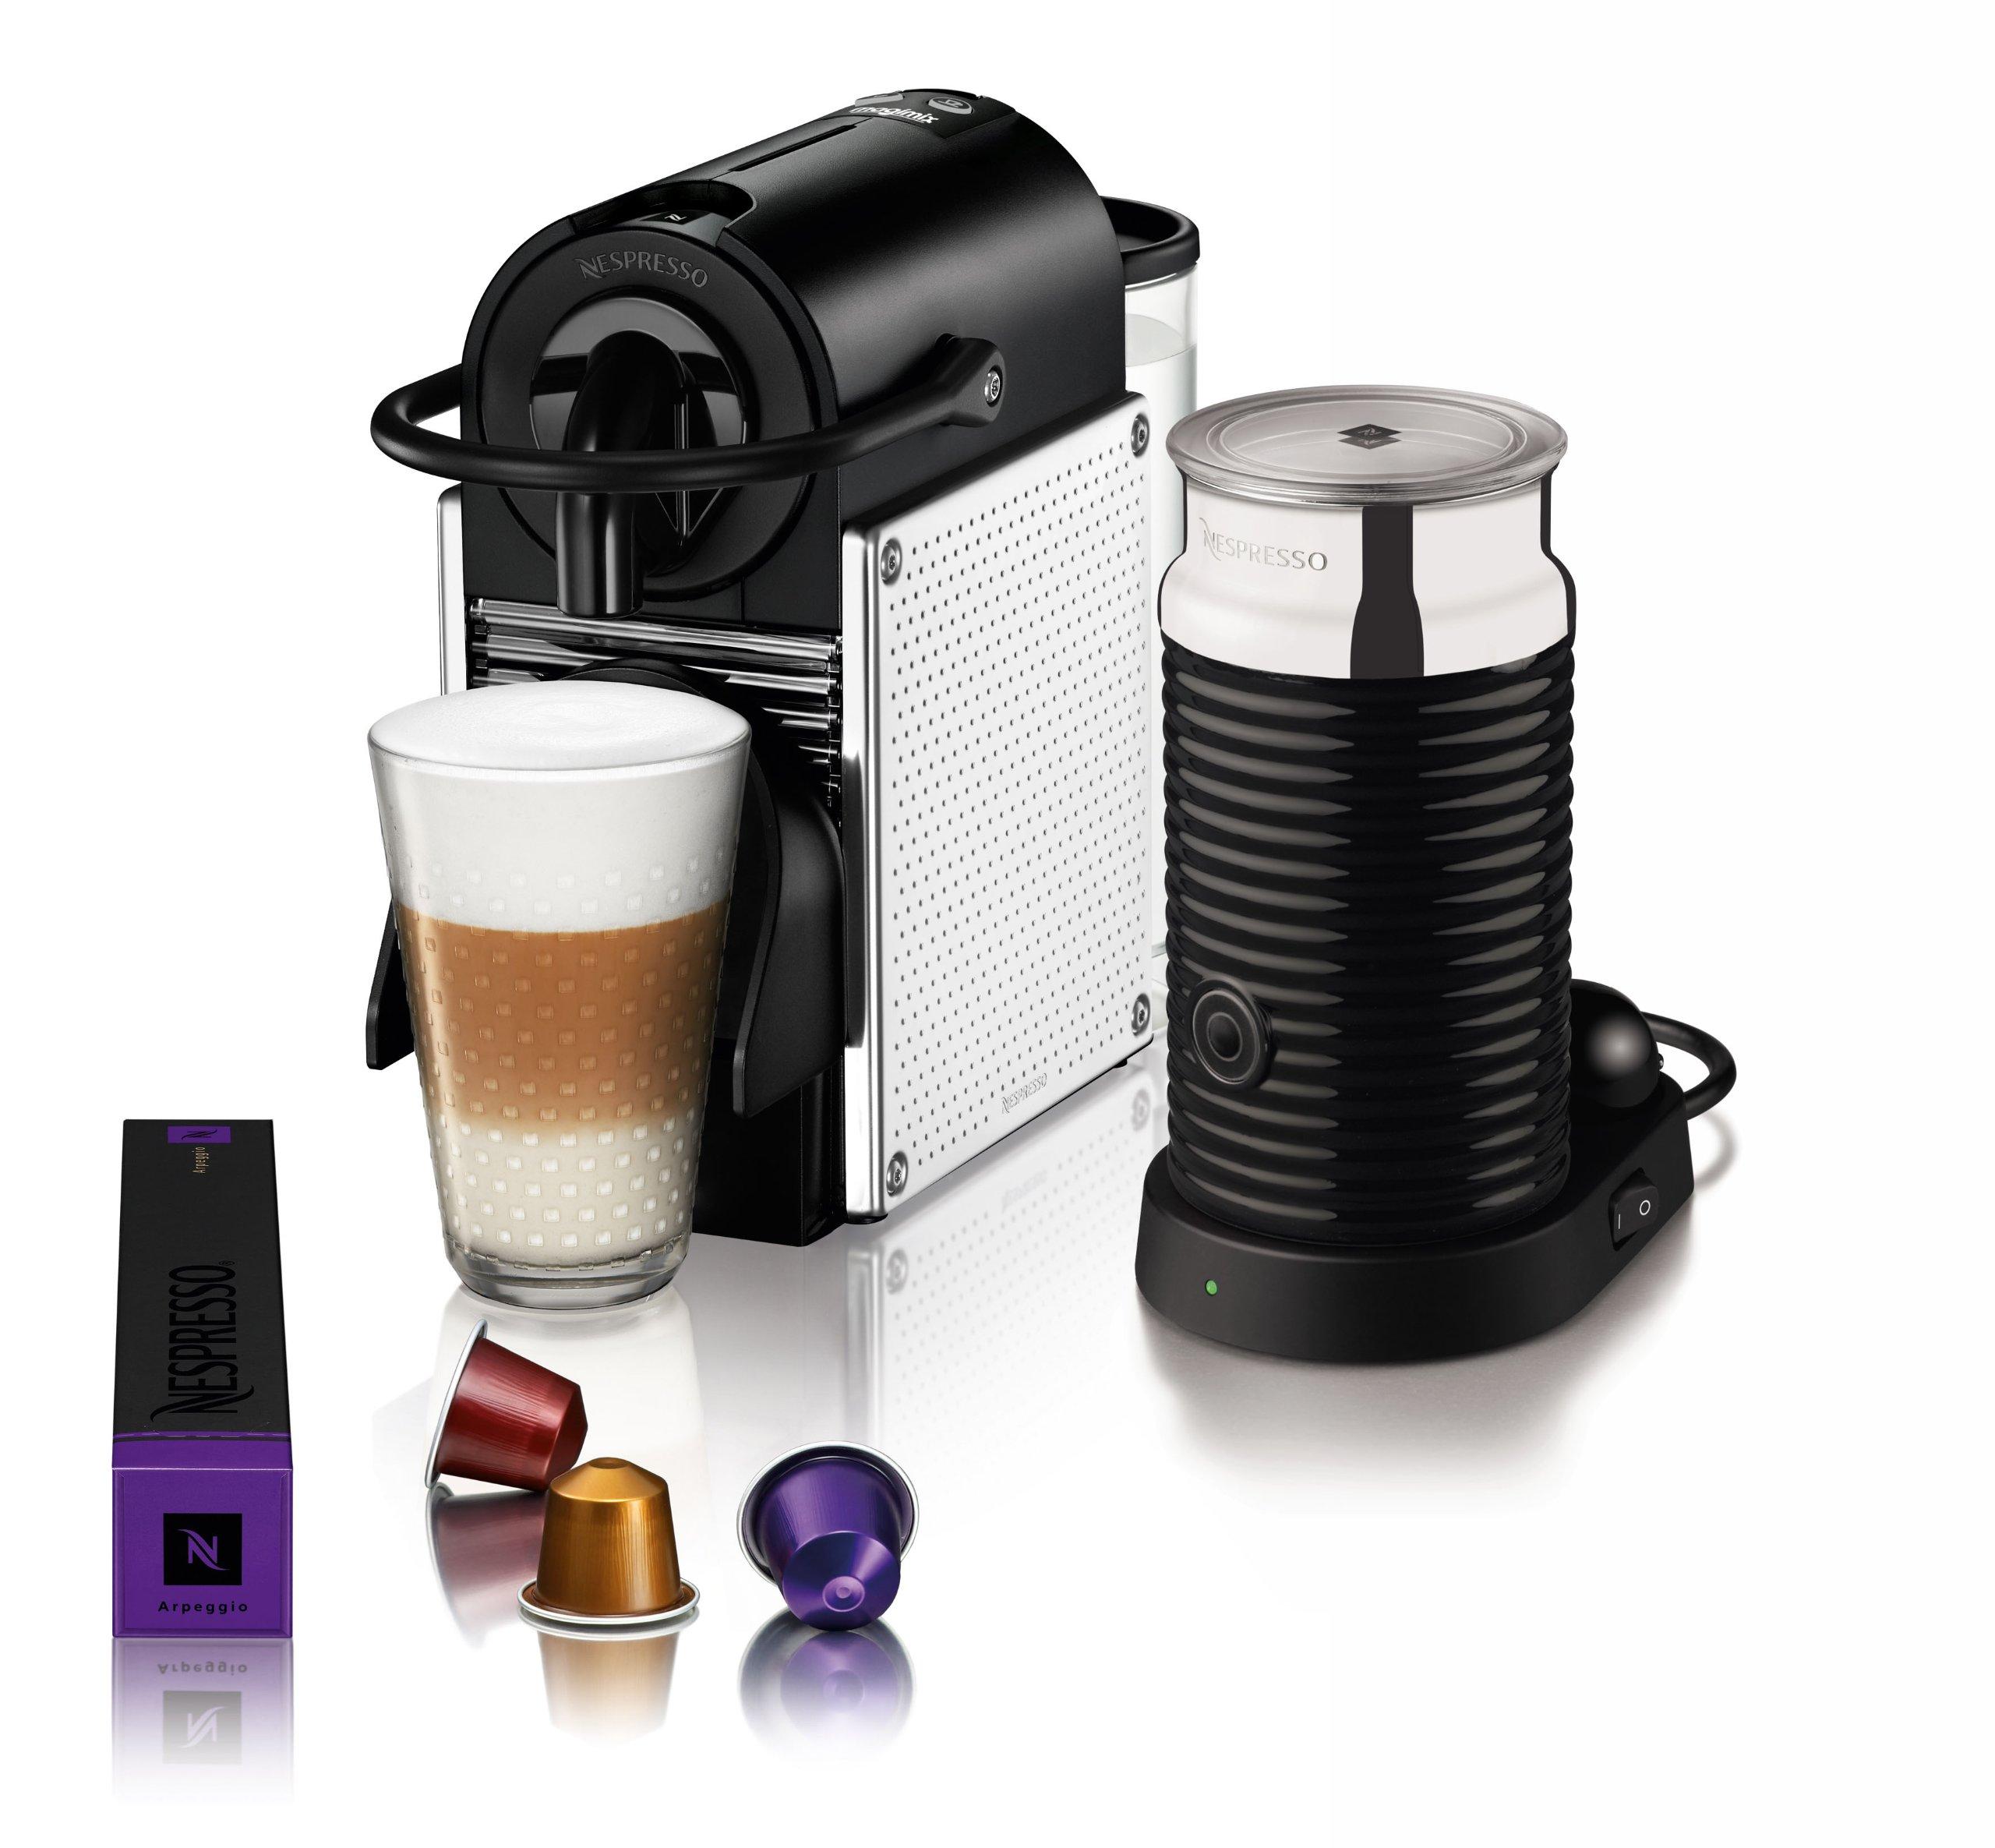 magimix 11328 nespresso pixie with aeroccino 3 1260 watt chrome ebay. Black Bedroom Furniture Sets. Home Design Ideas